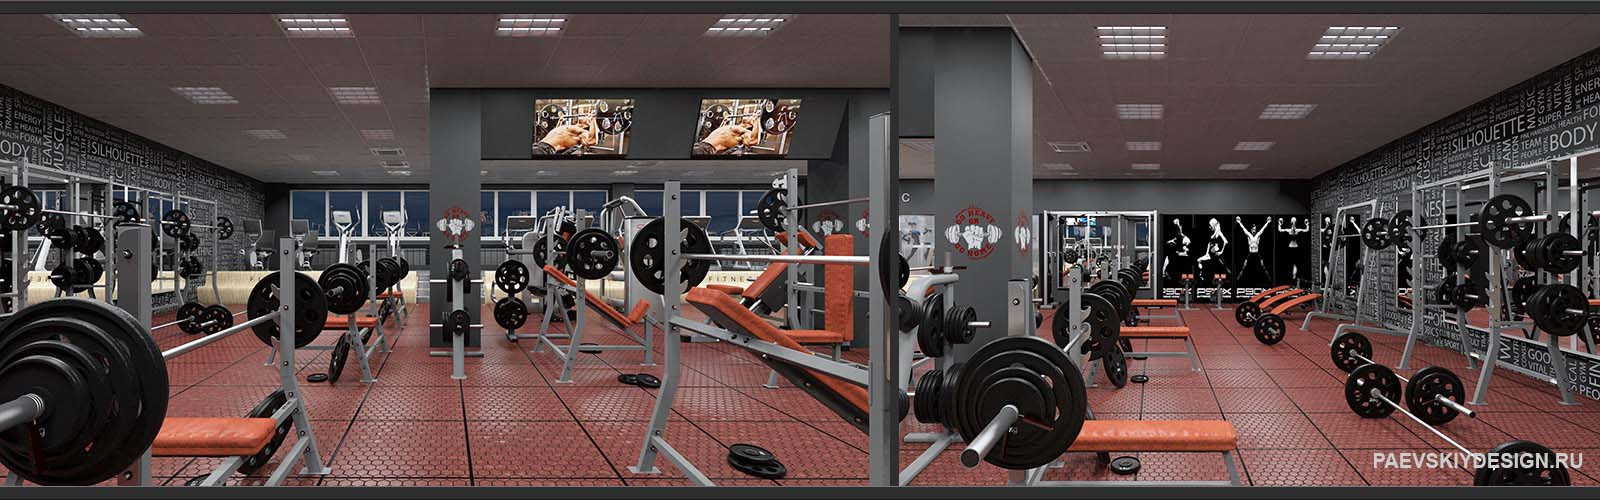 Дизайн фитнес клуба под ключ Разработка проектов фитнес клубов и фитнес центров